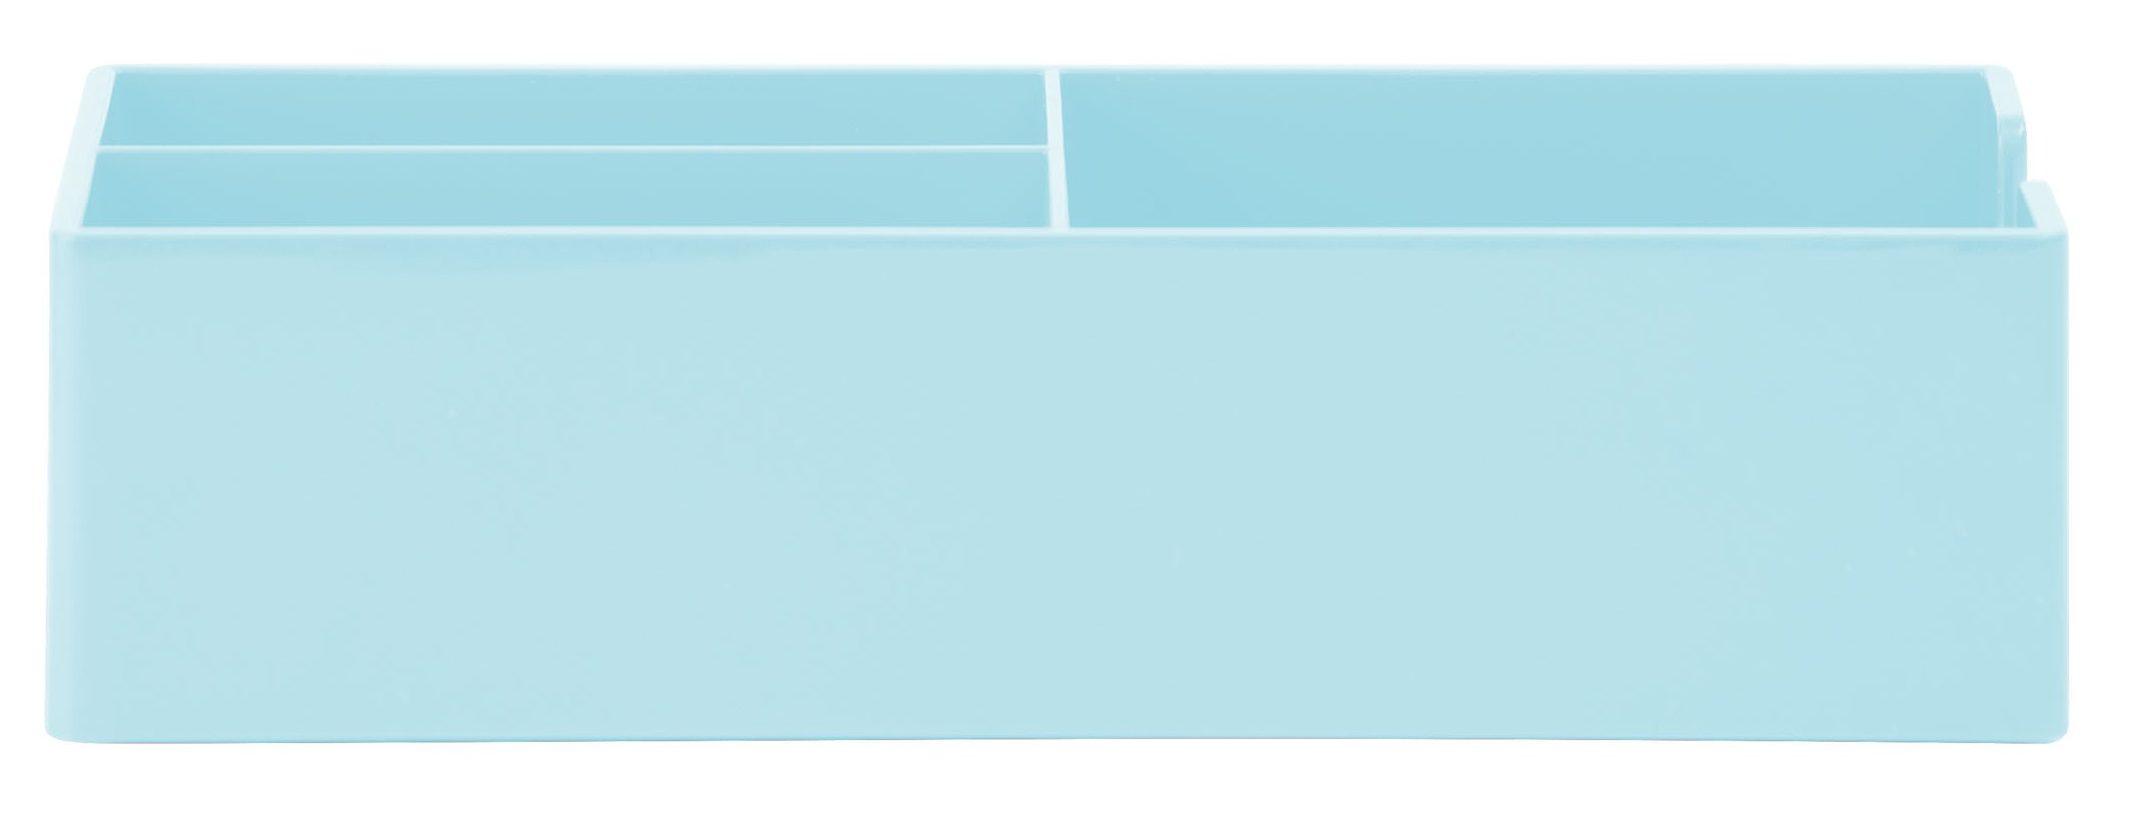 desk_tray